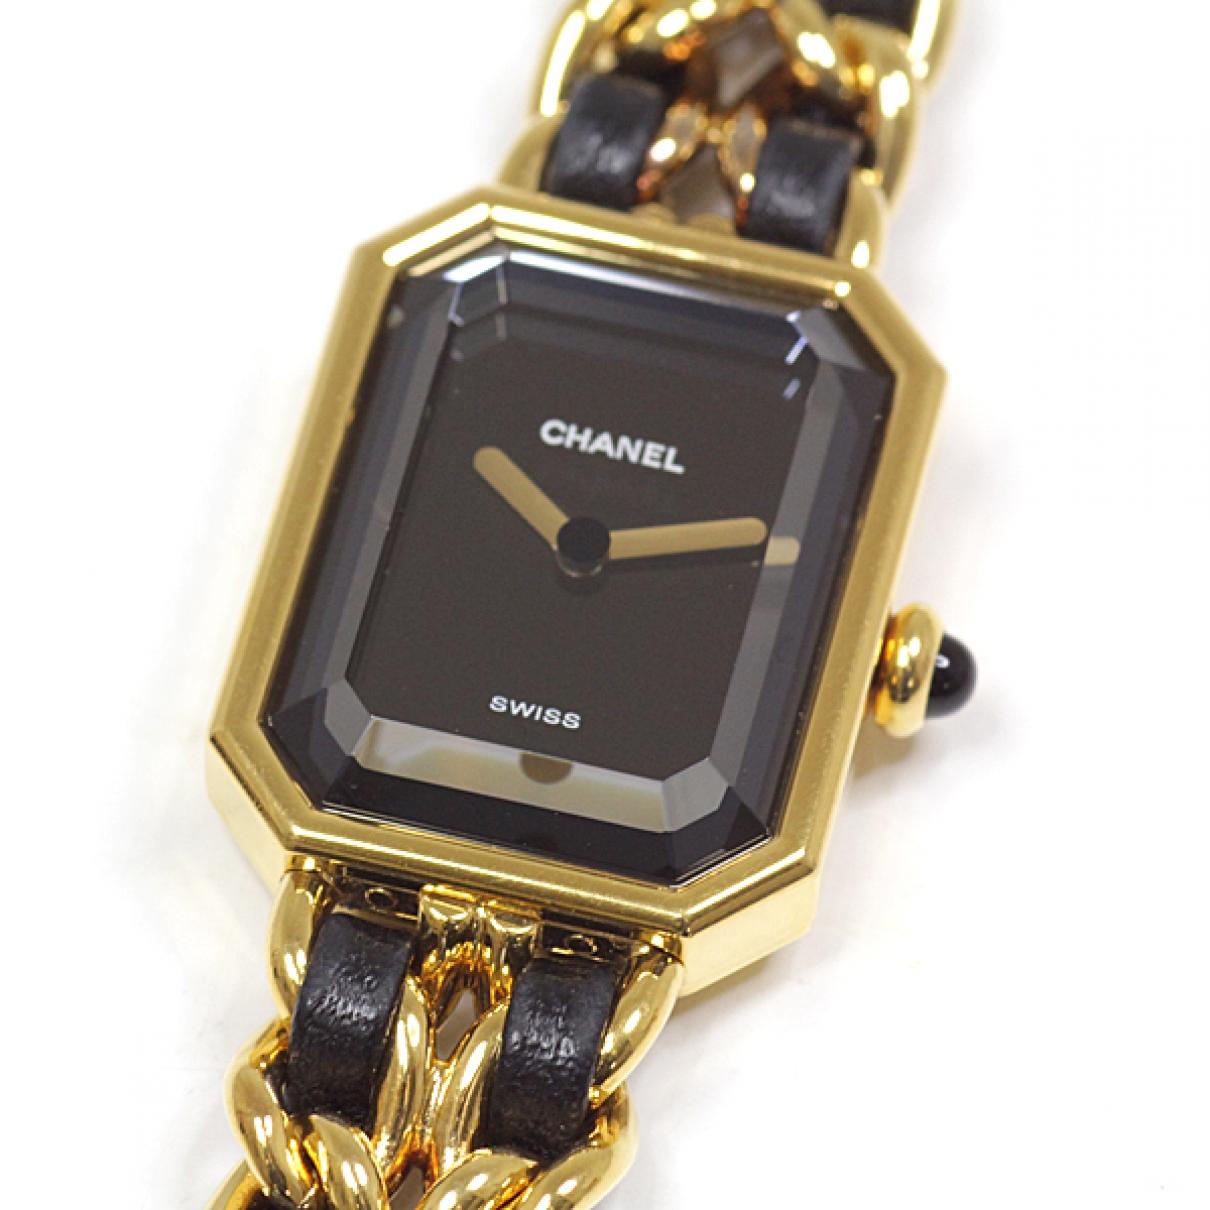 Chanel Premiere Uhr in Vergoldet